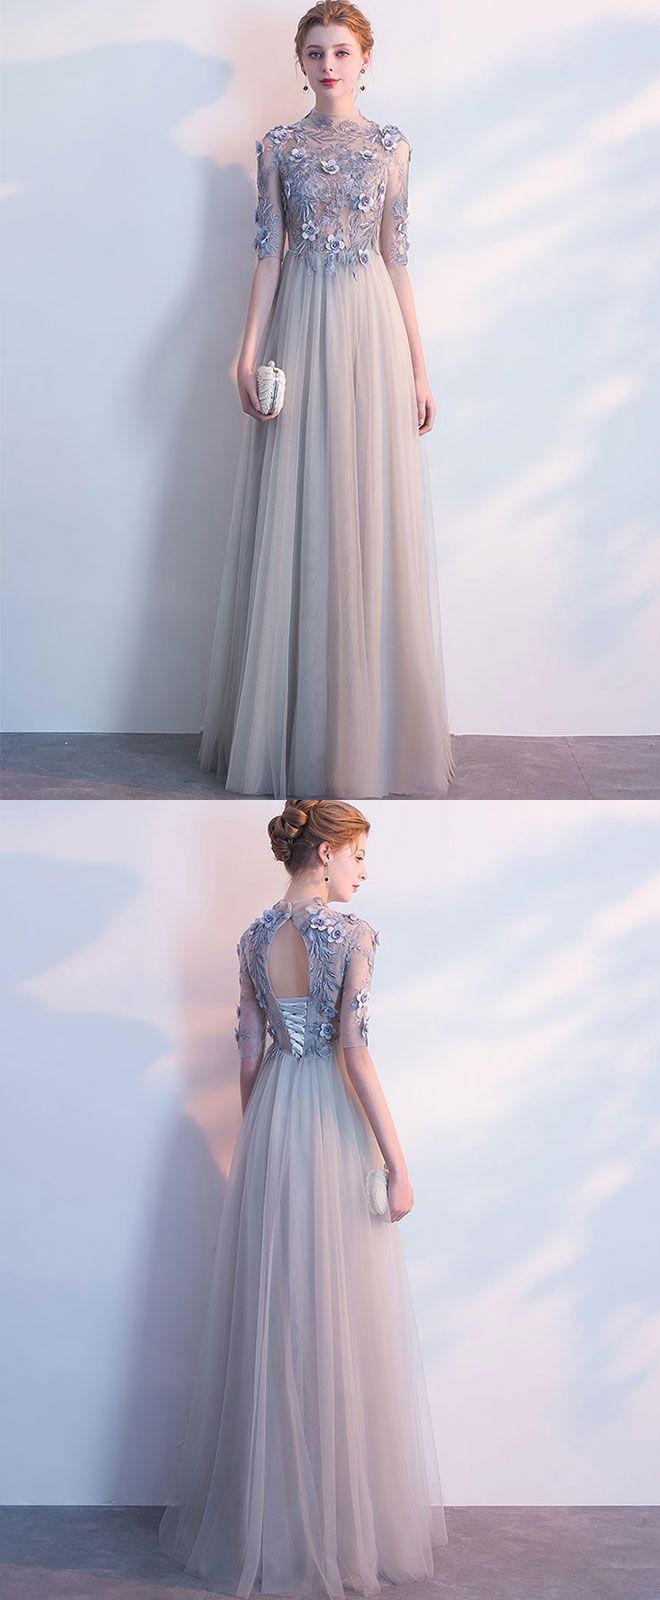 Gray long sleeve lace long prom dress, lace evening dress